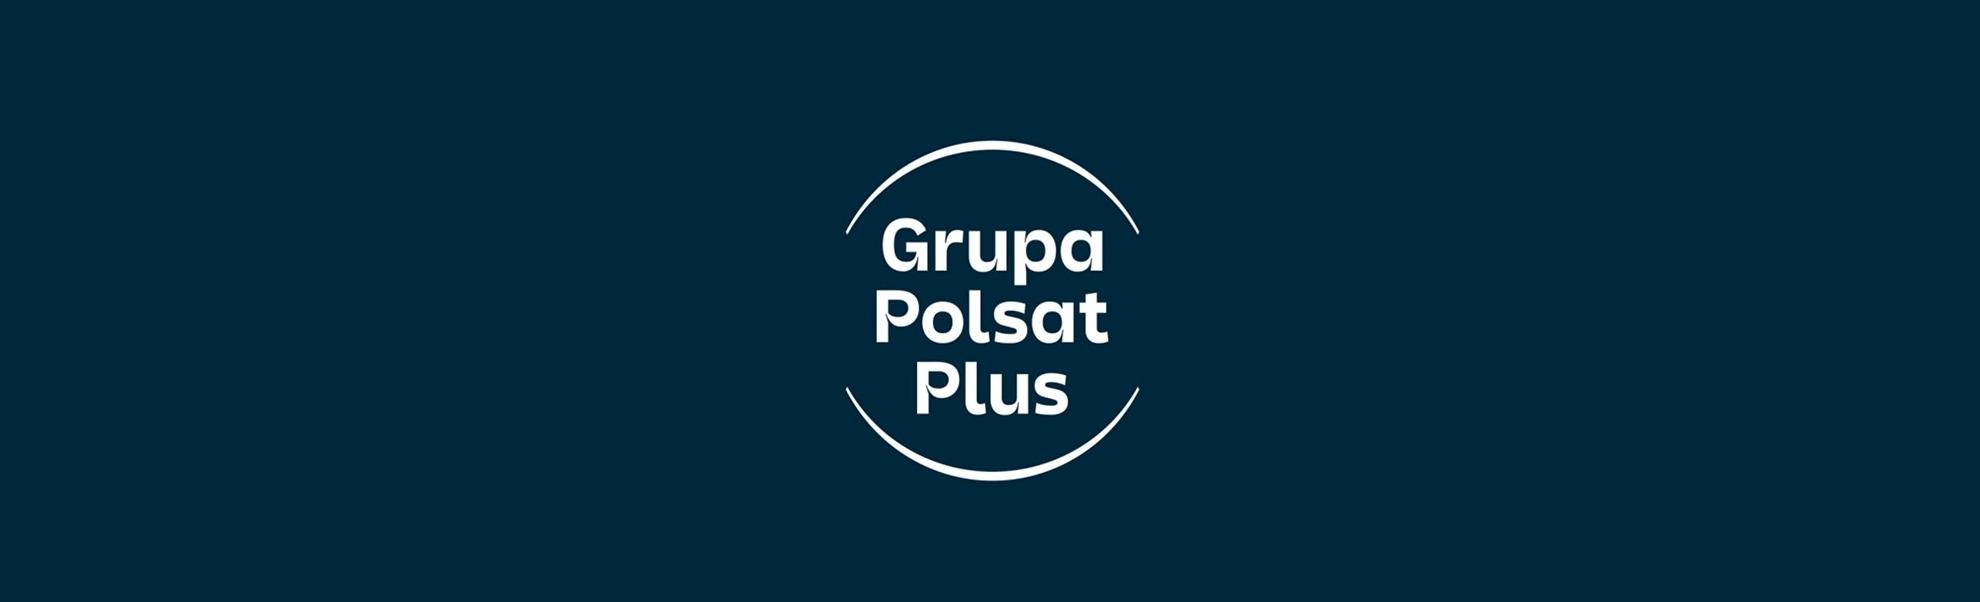 grupapolsatplus